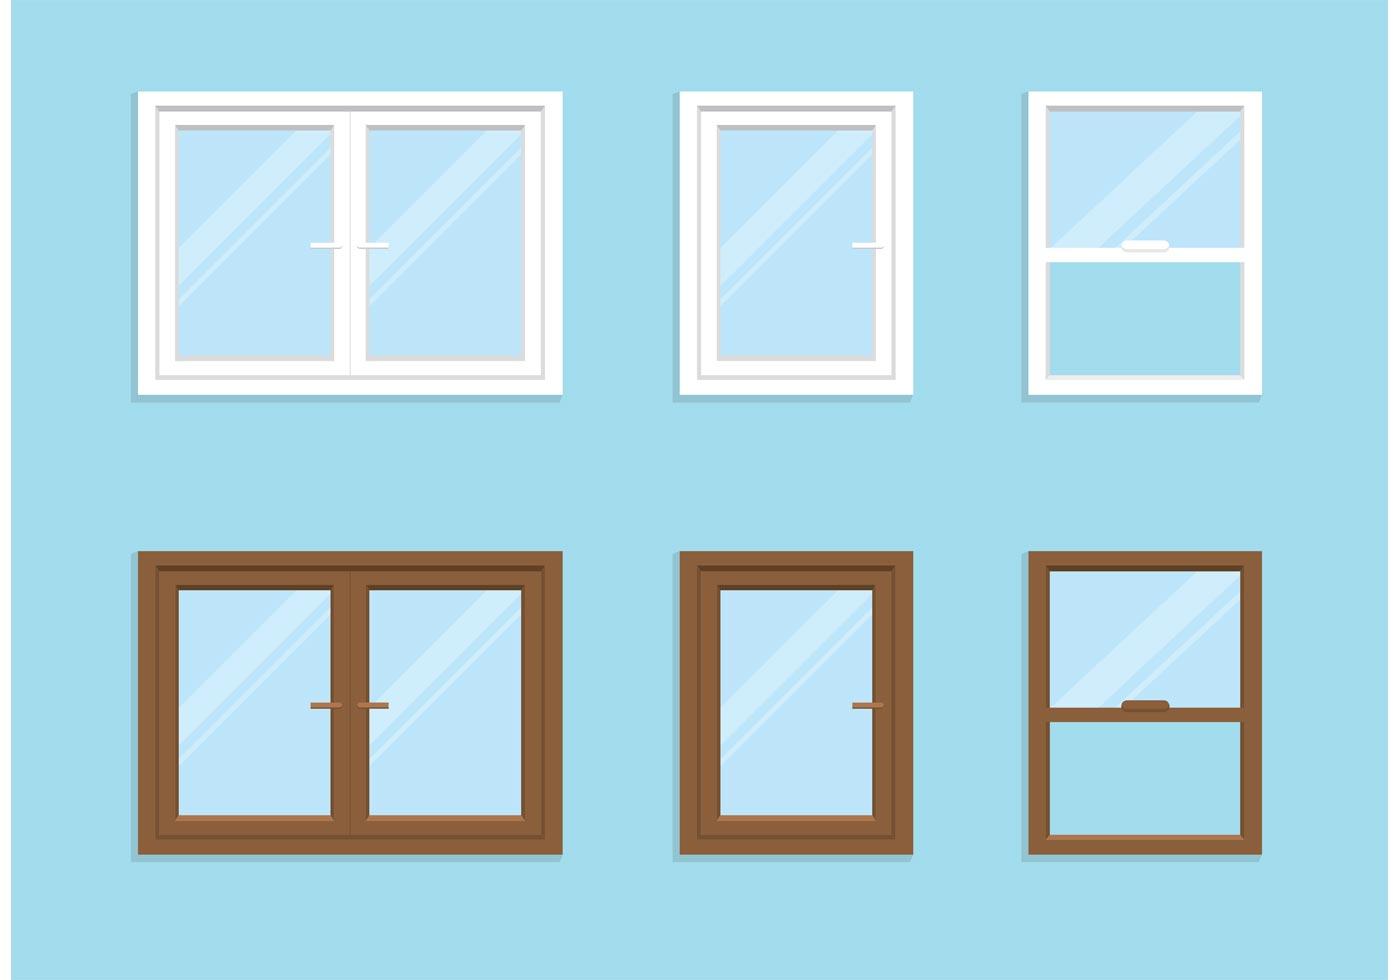 Free vector window set download free vector art stock for Window design 4 by 4